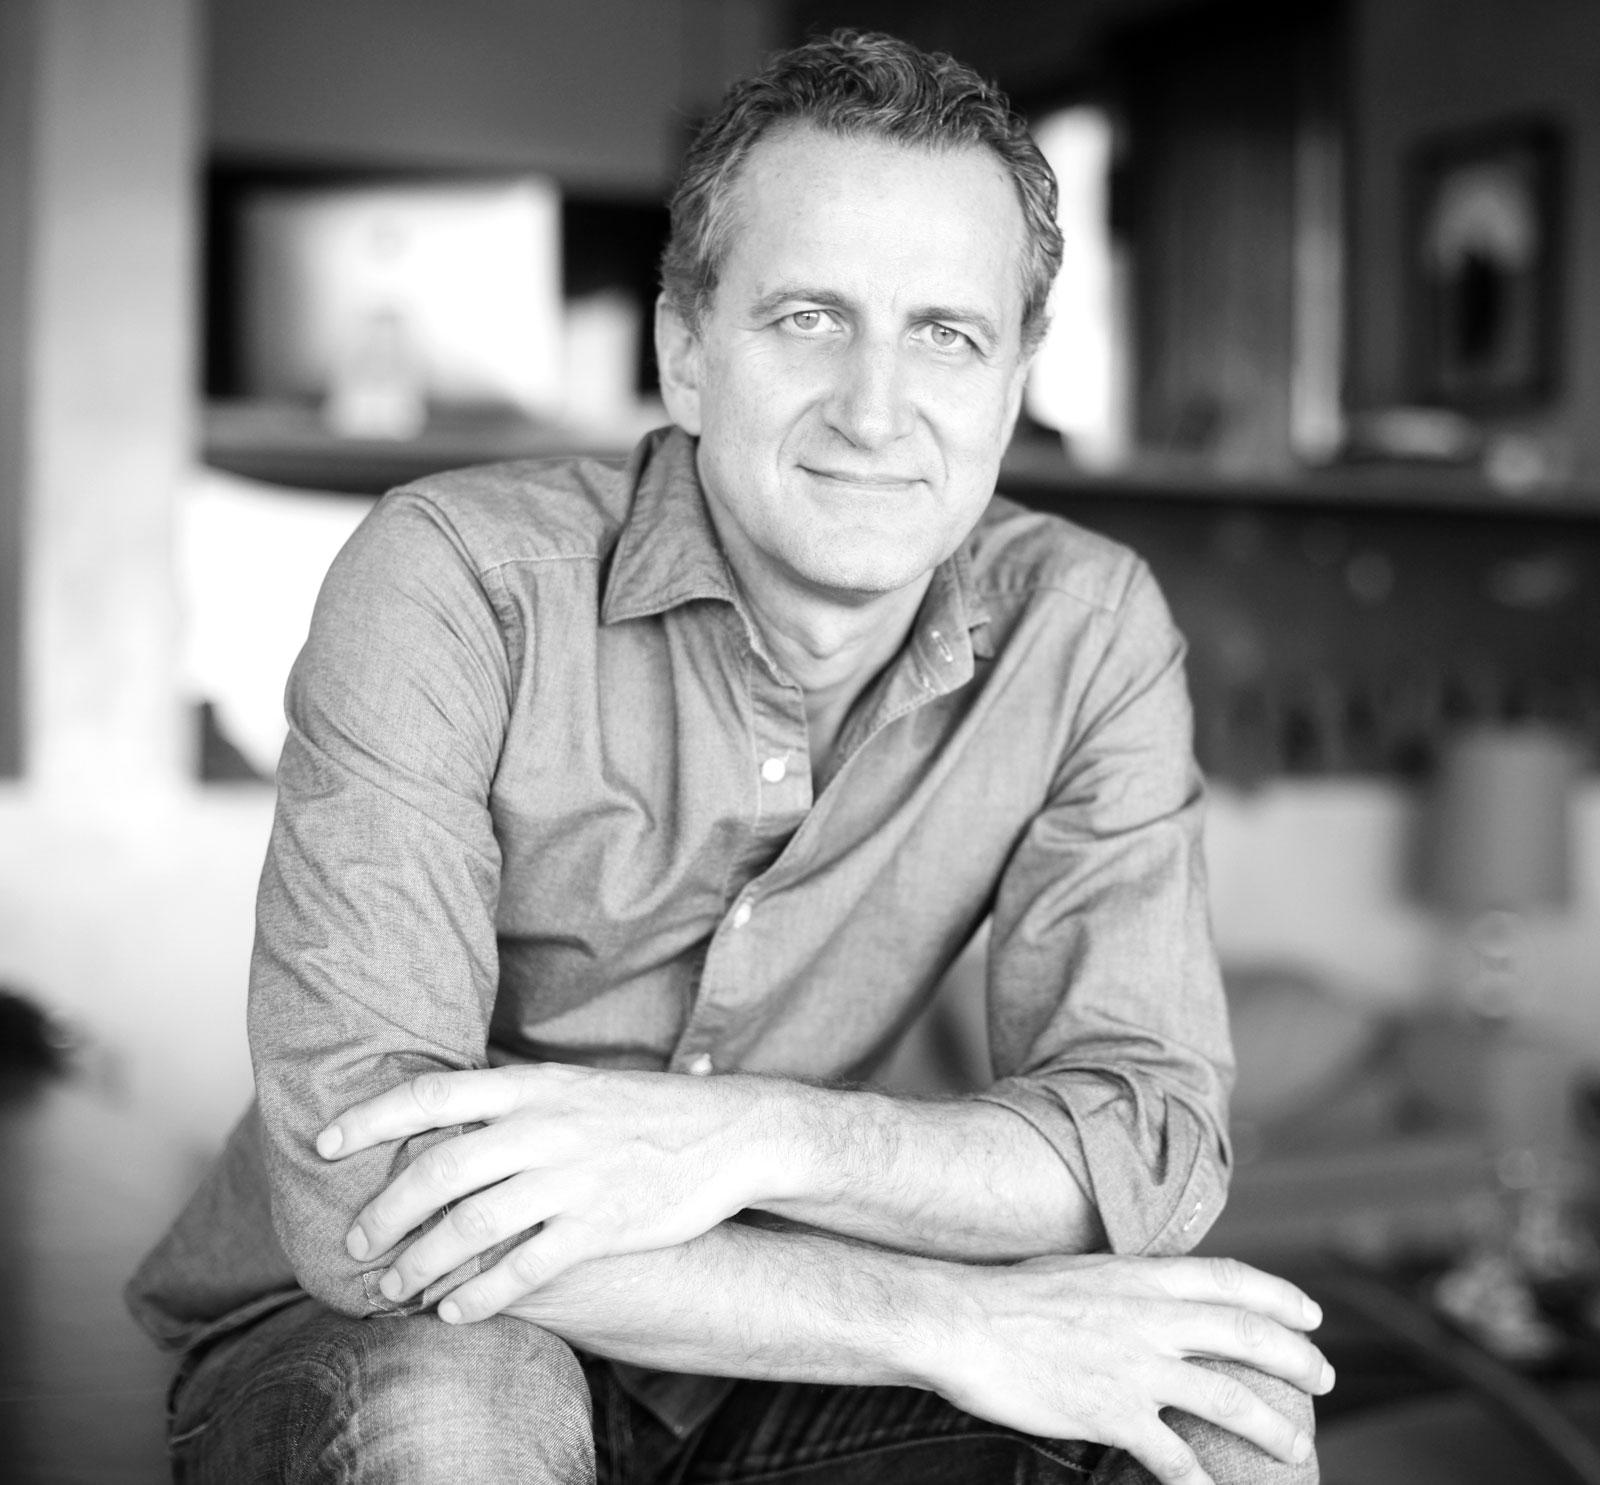 Matthias Hinz